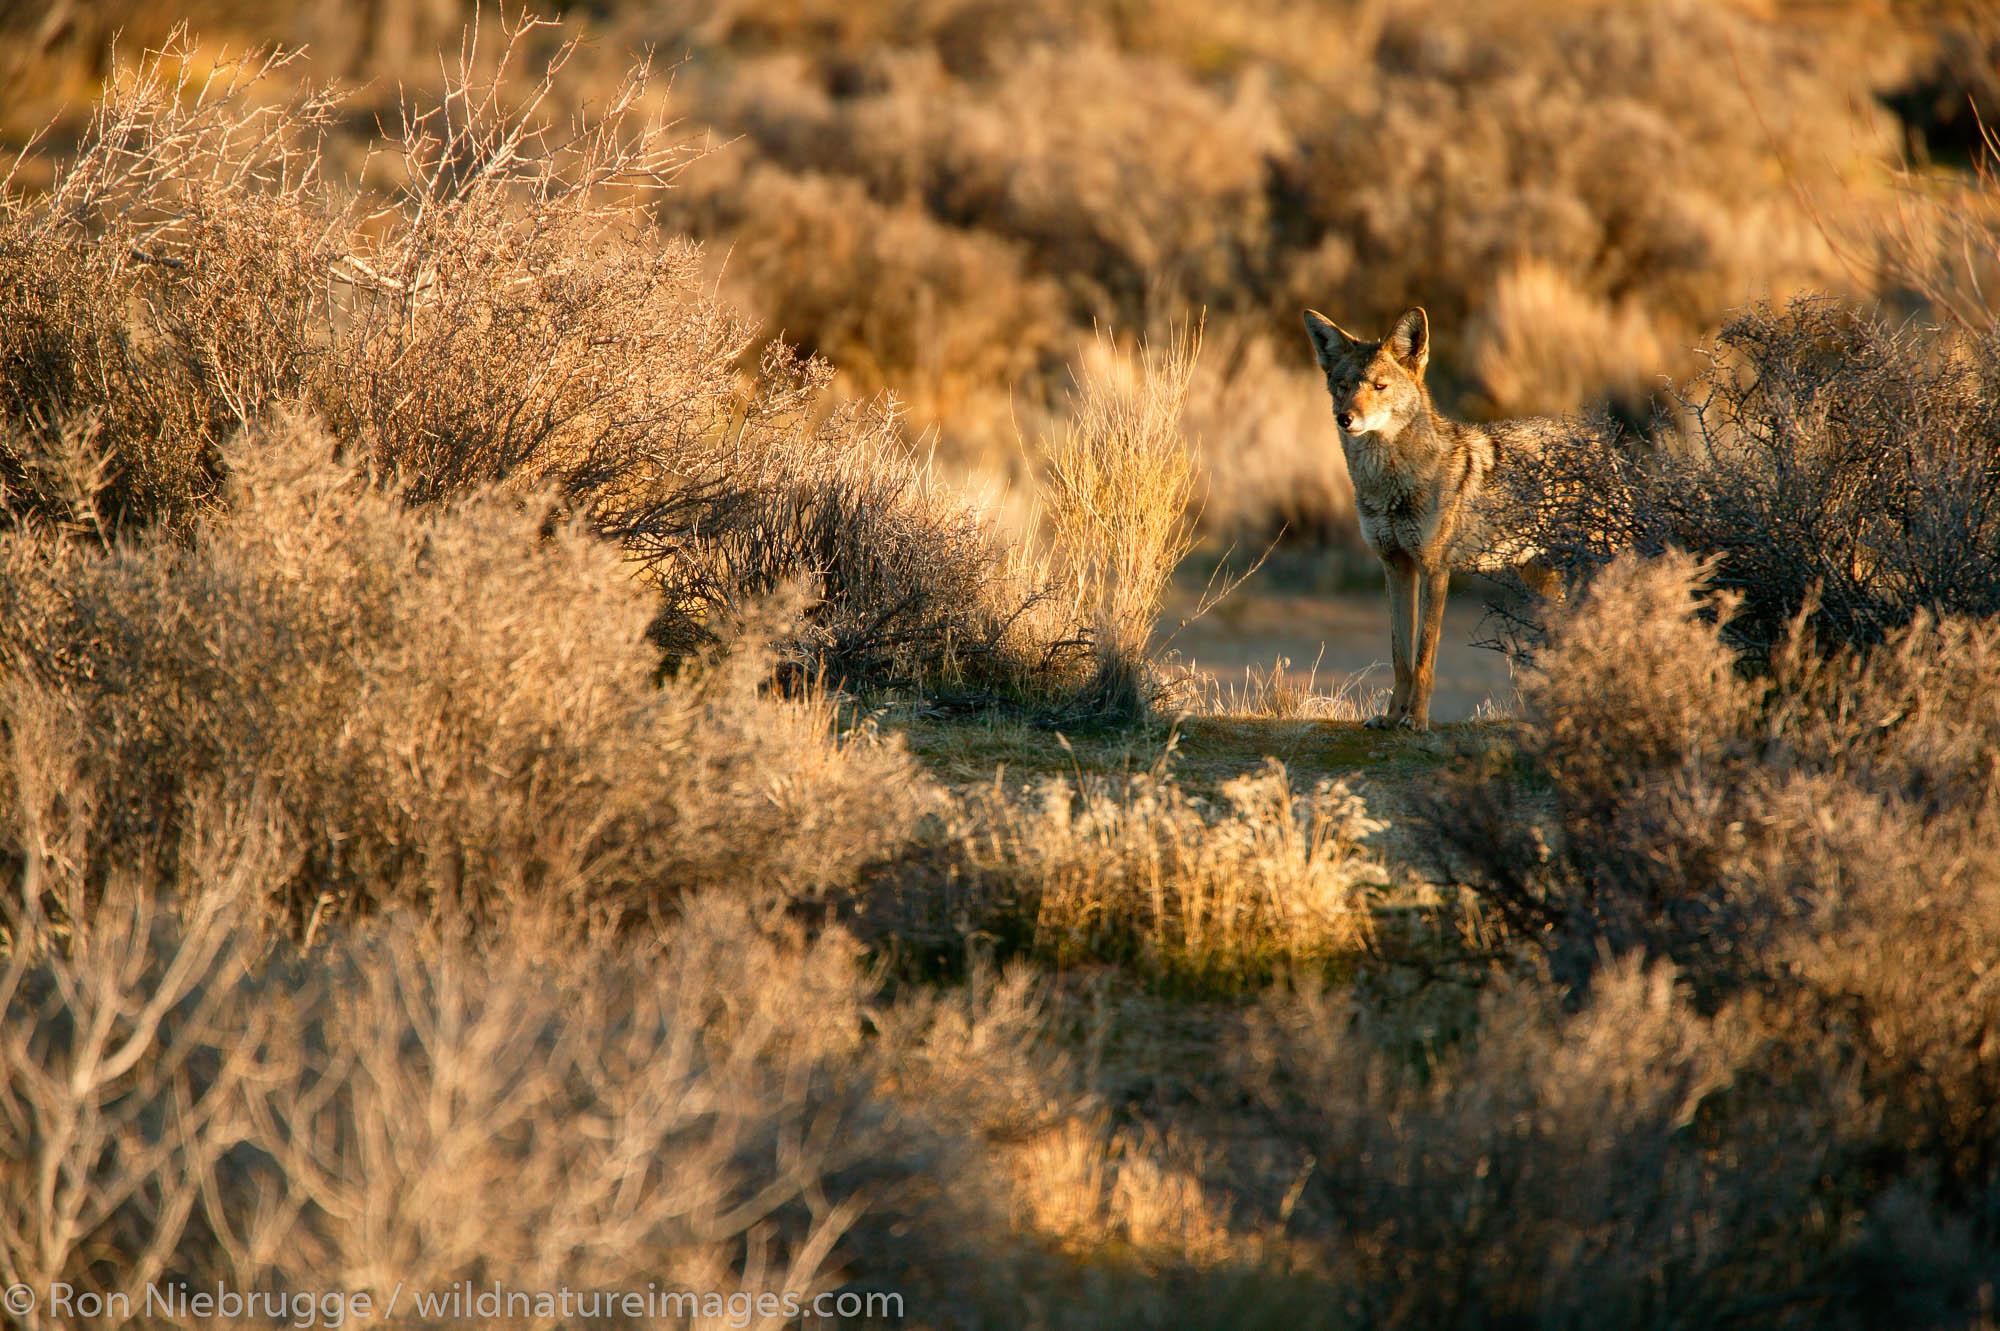 Coyote in the Mojave Desert.